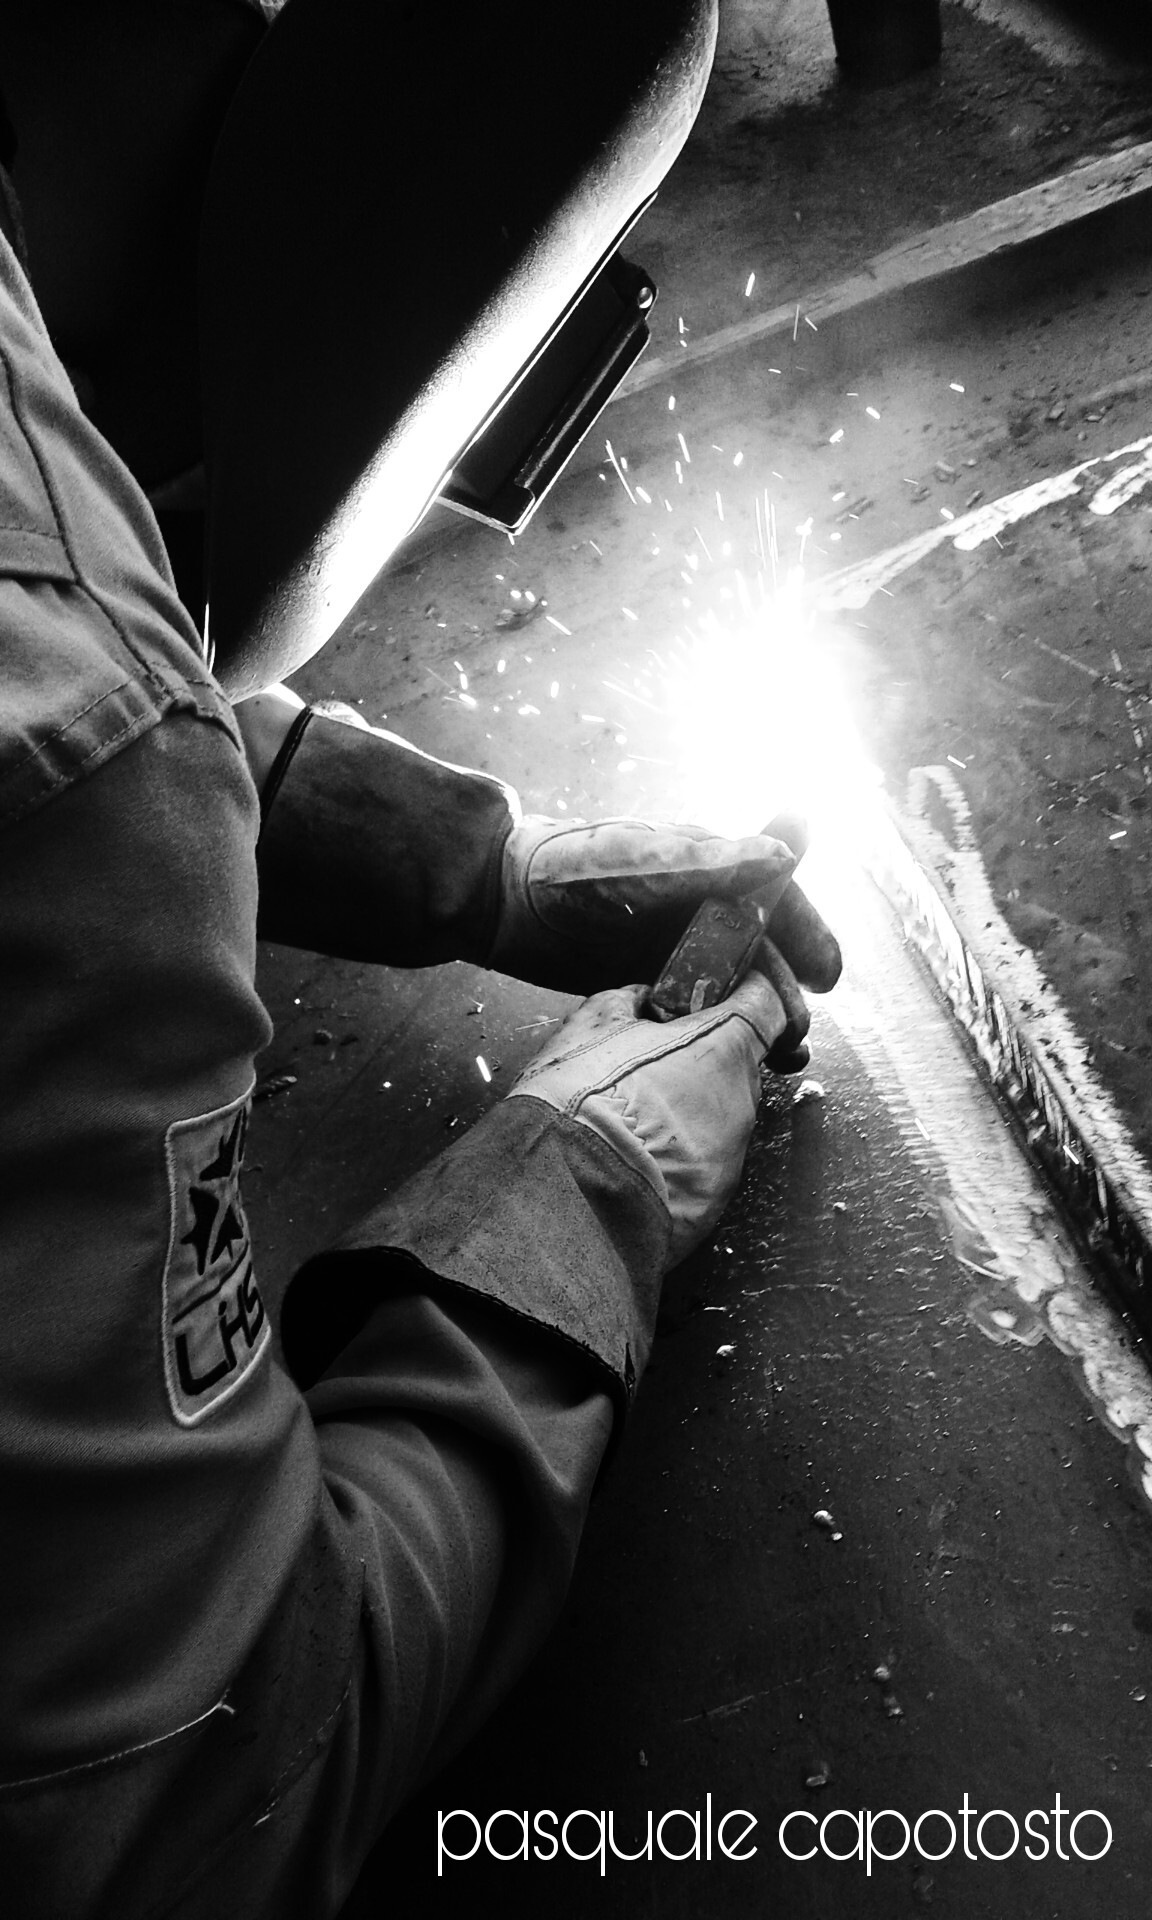 welder by Pasquale Capotosto